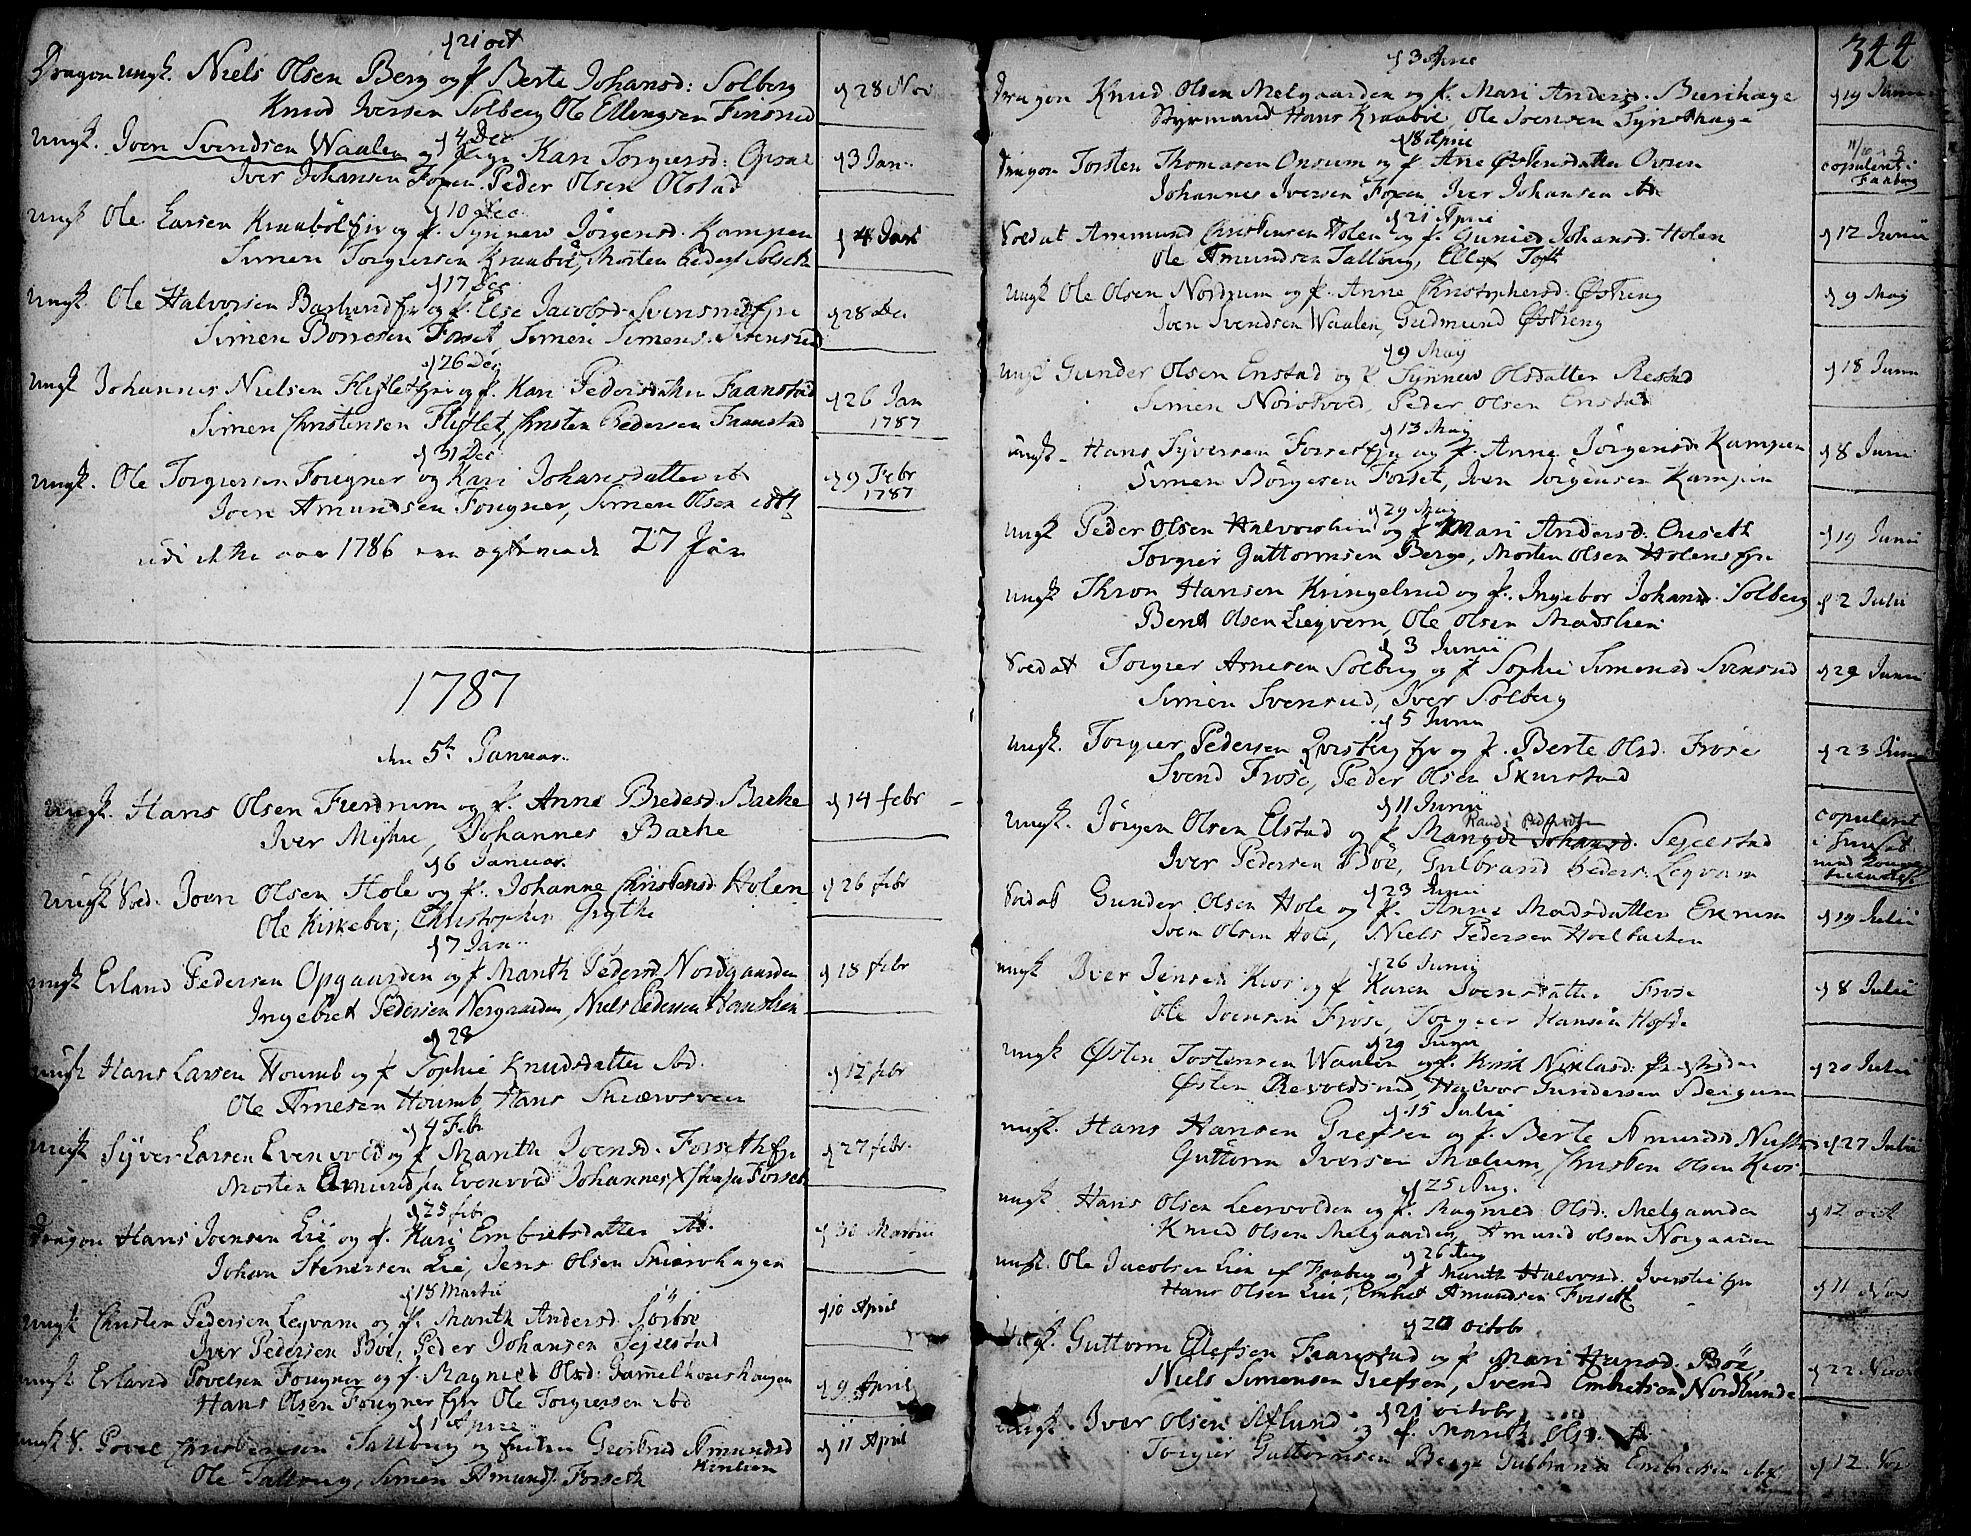 SAH, Gausdal prestekontor, Ministerialbok nr. 3, 1758-1809, s. 344